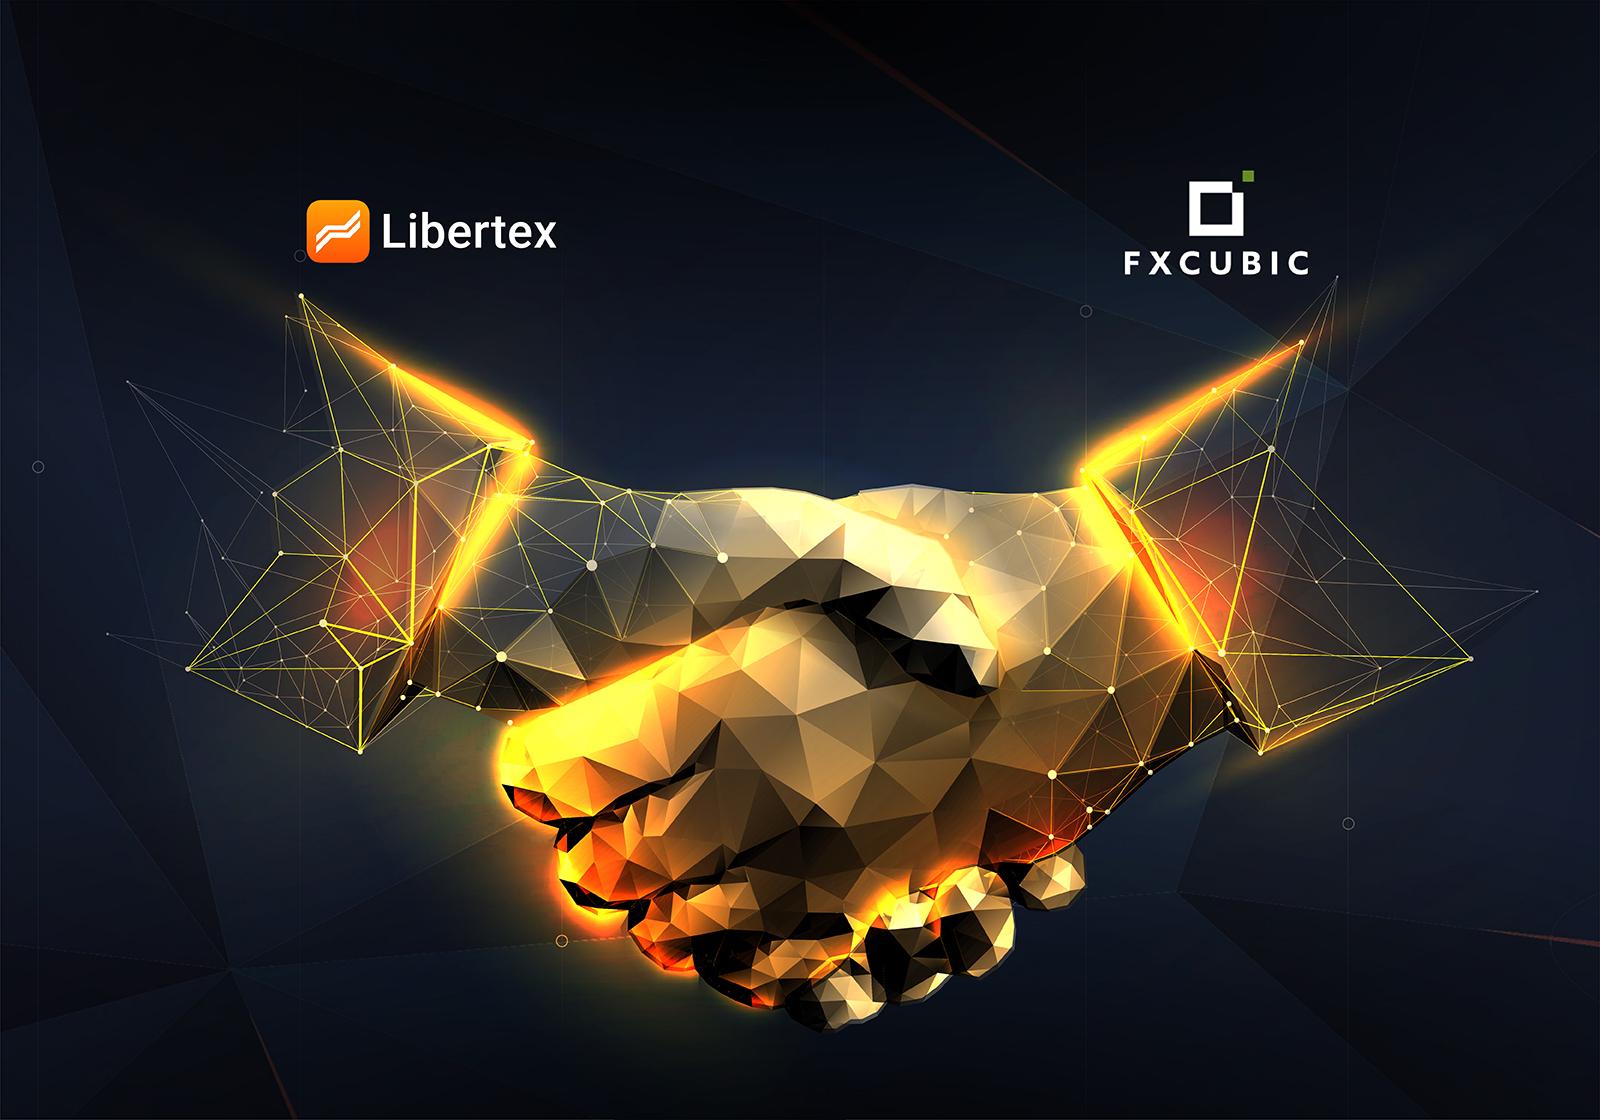 Acuerdo FXCubic y Libertex